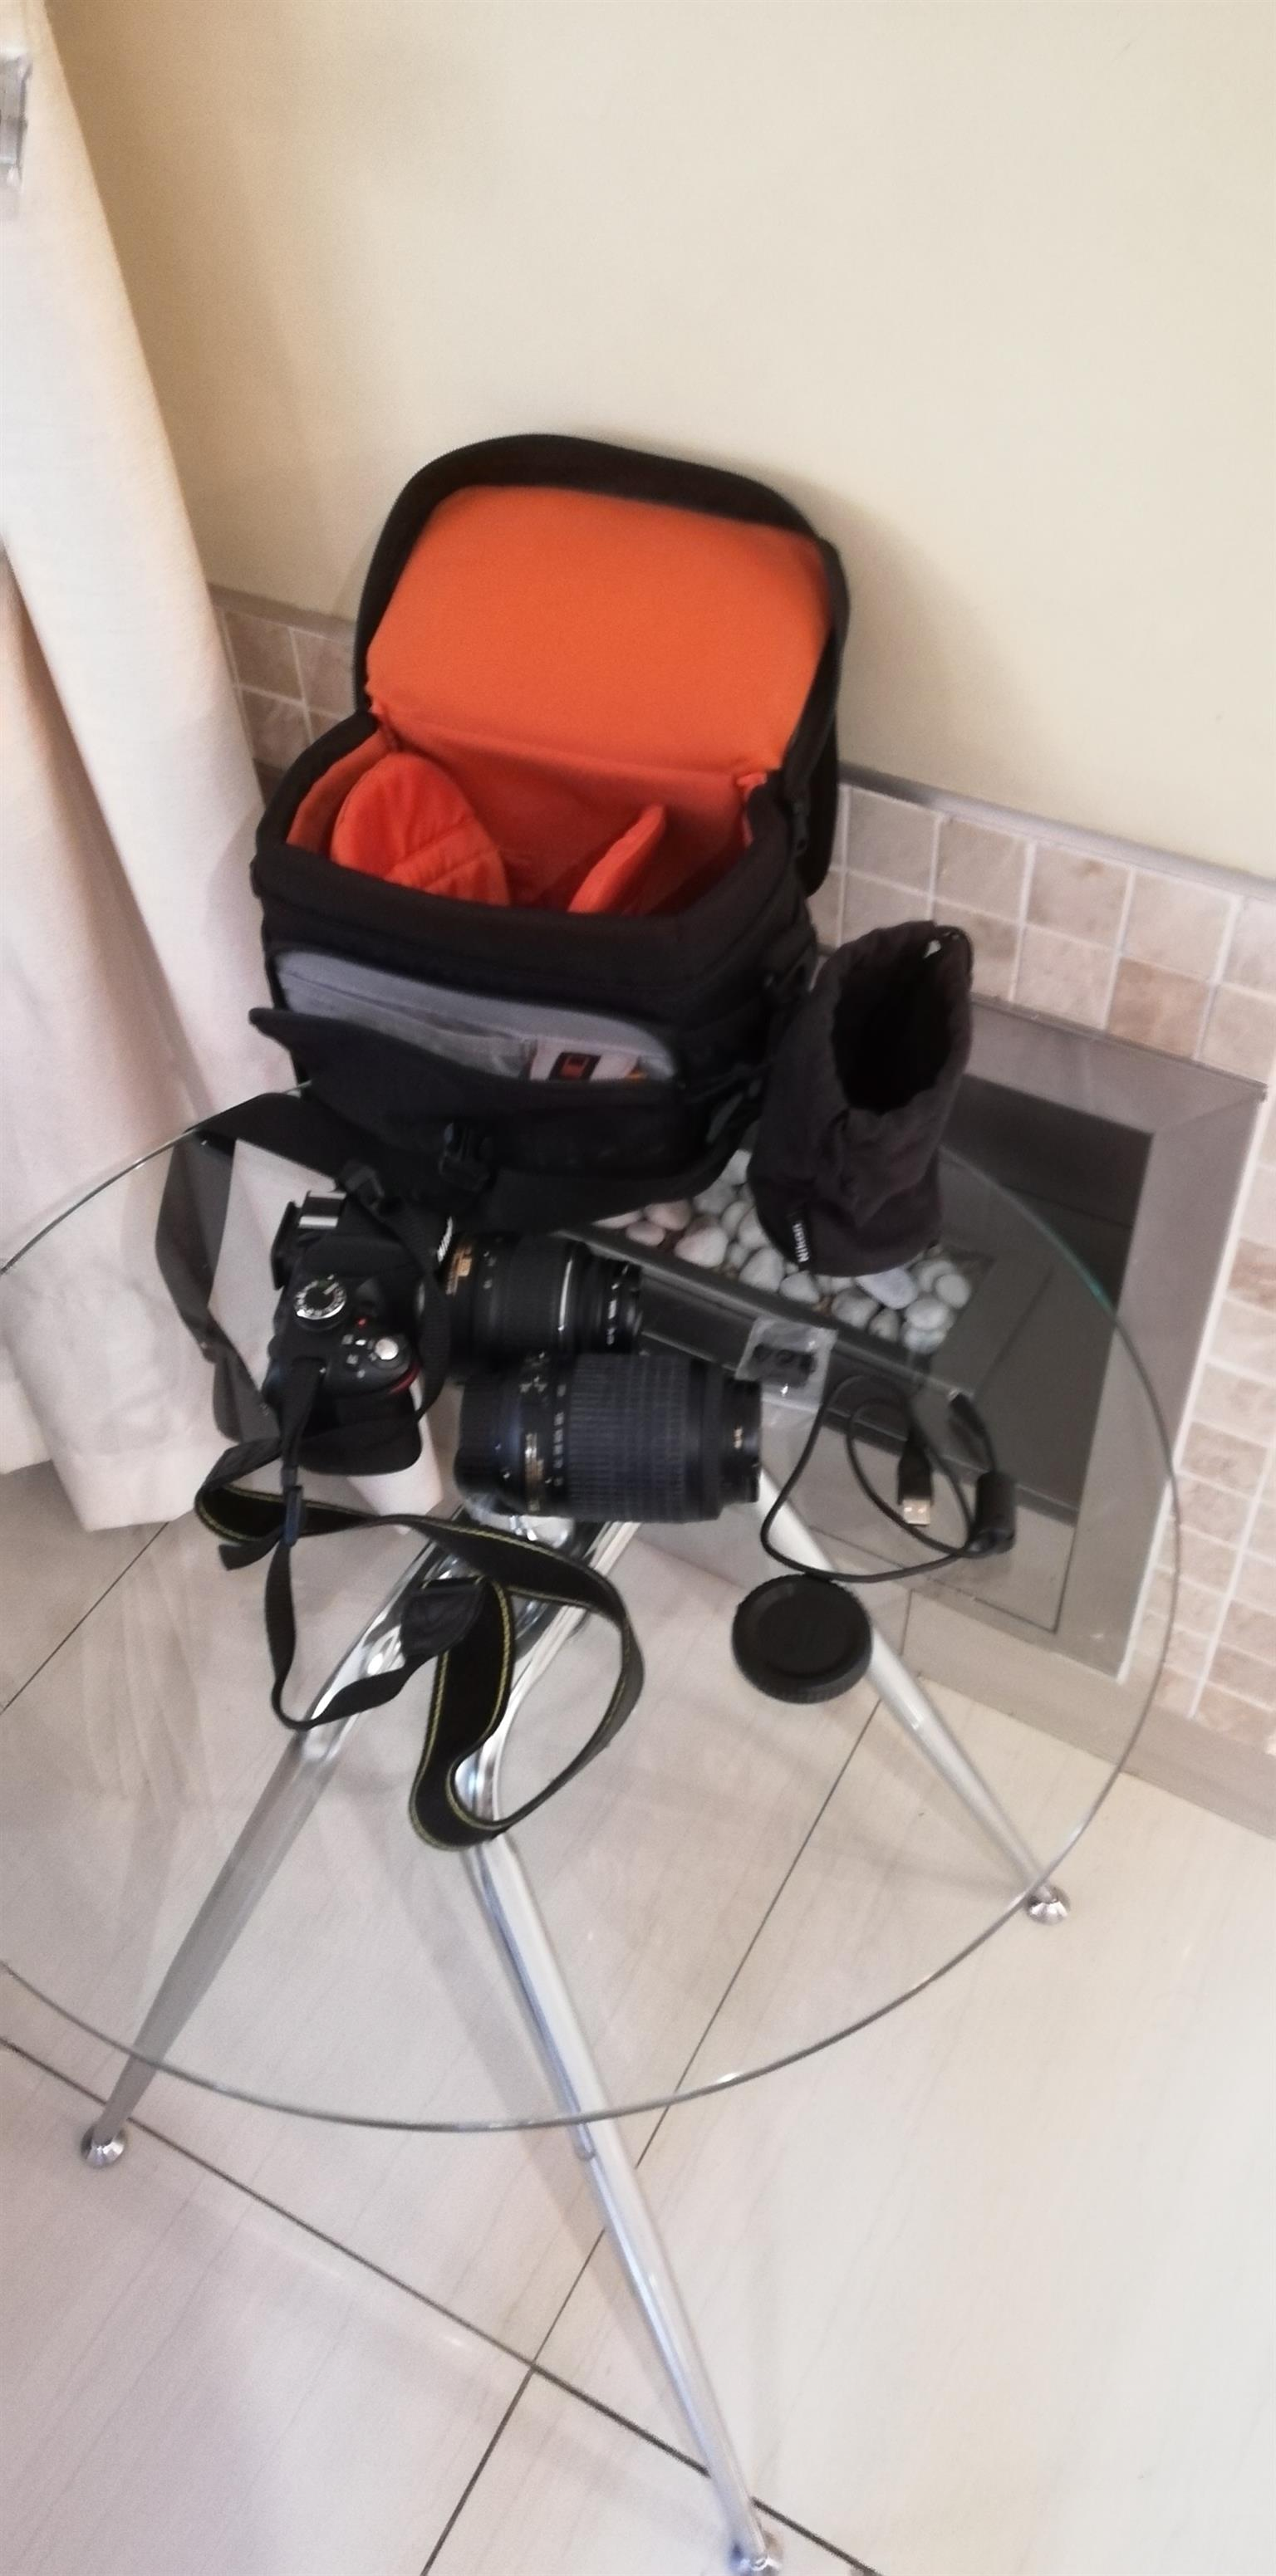 Nikon D3200 +extra lens and bag